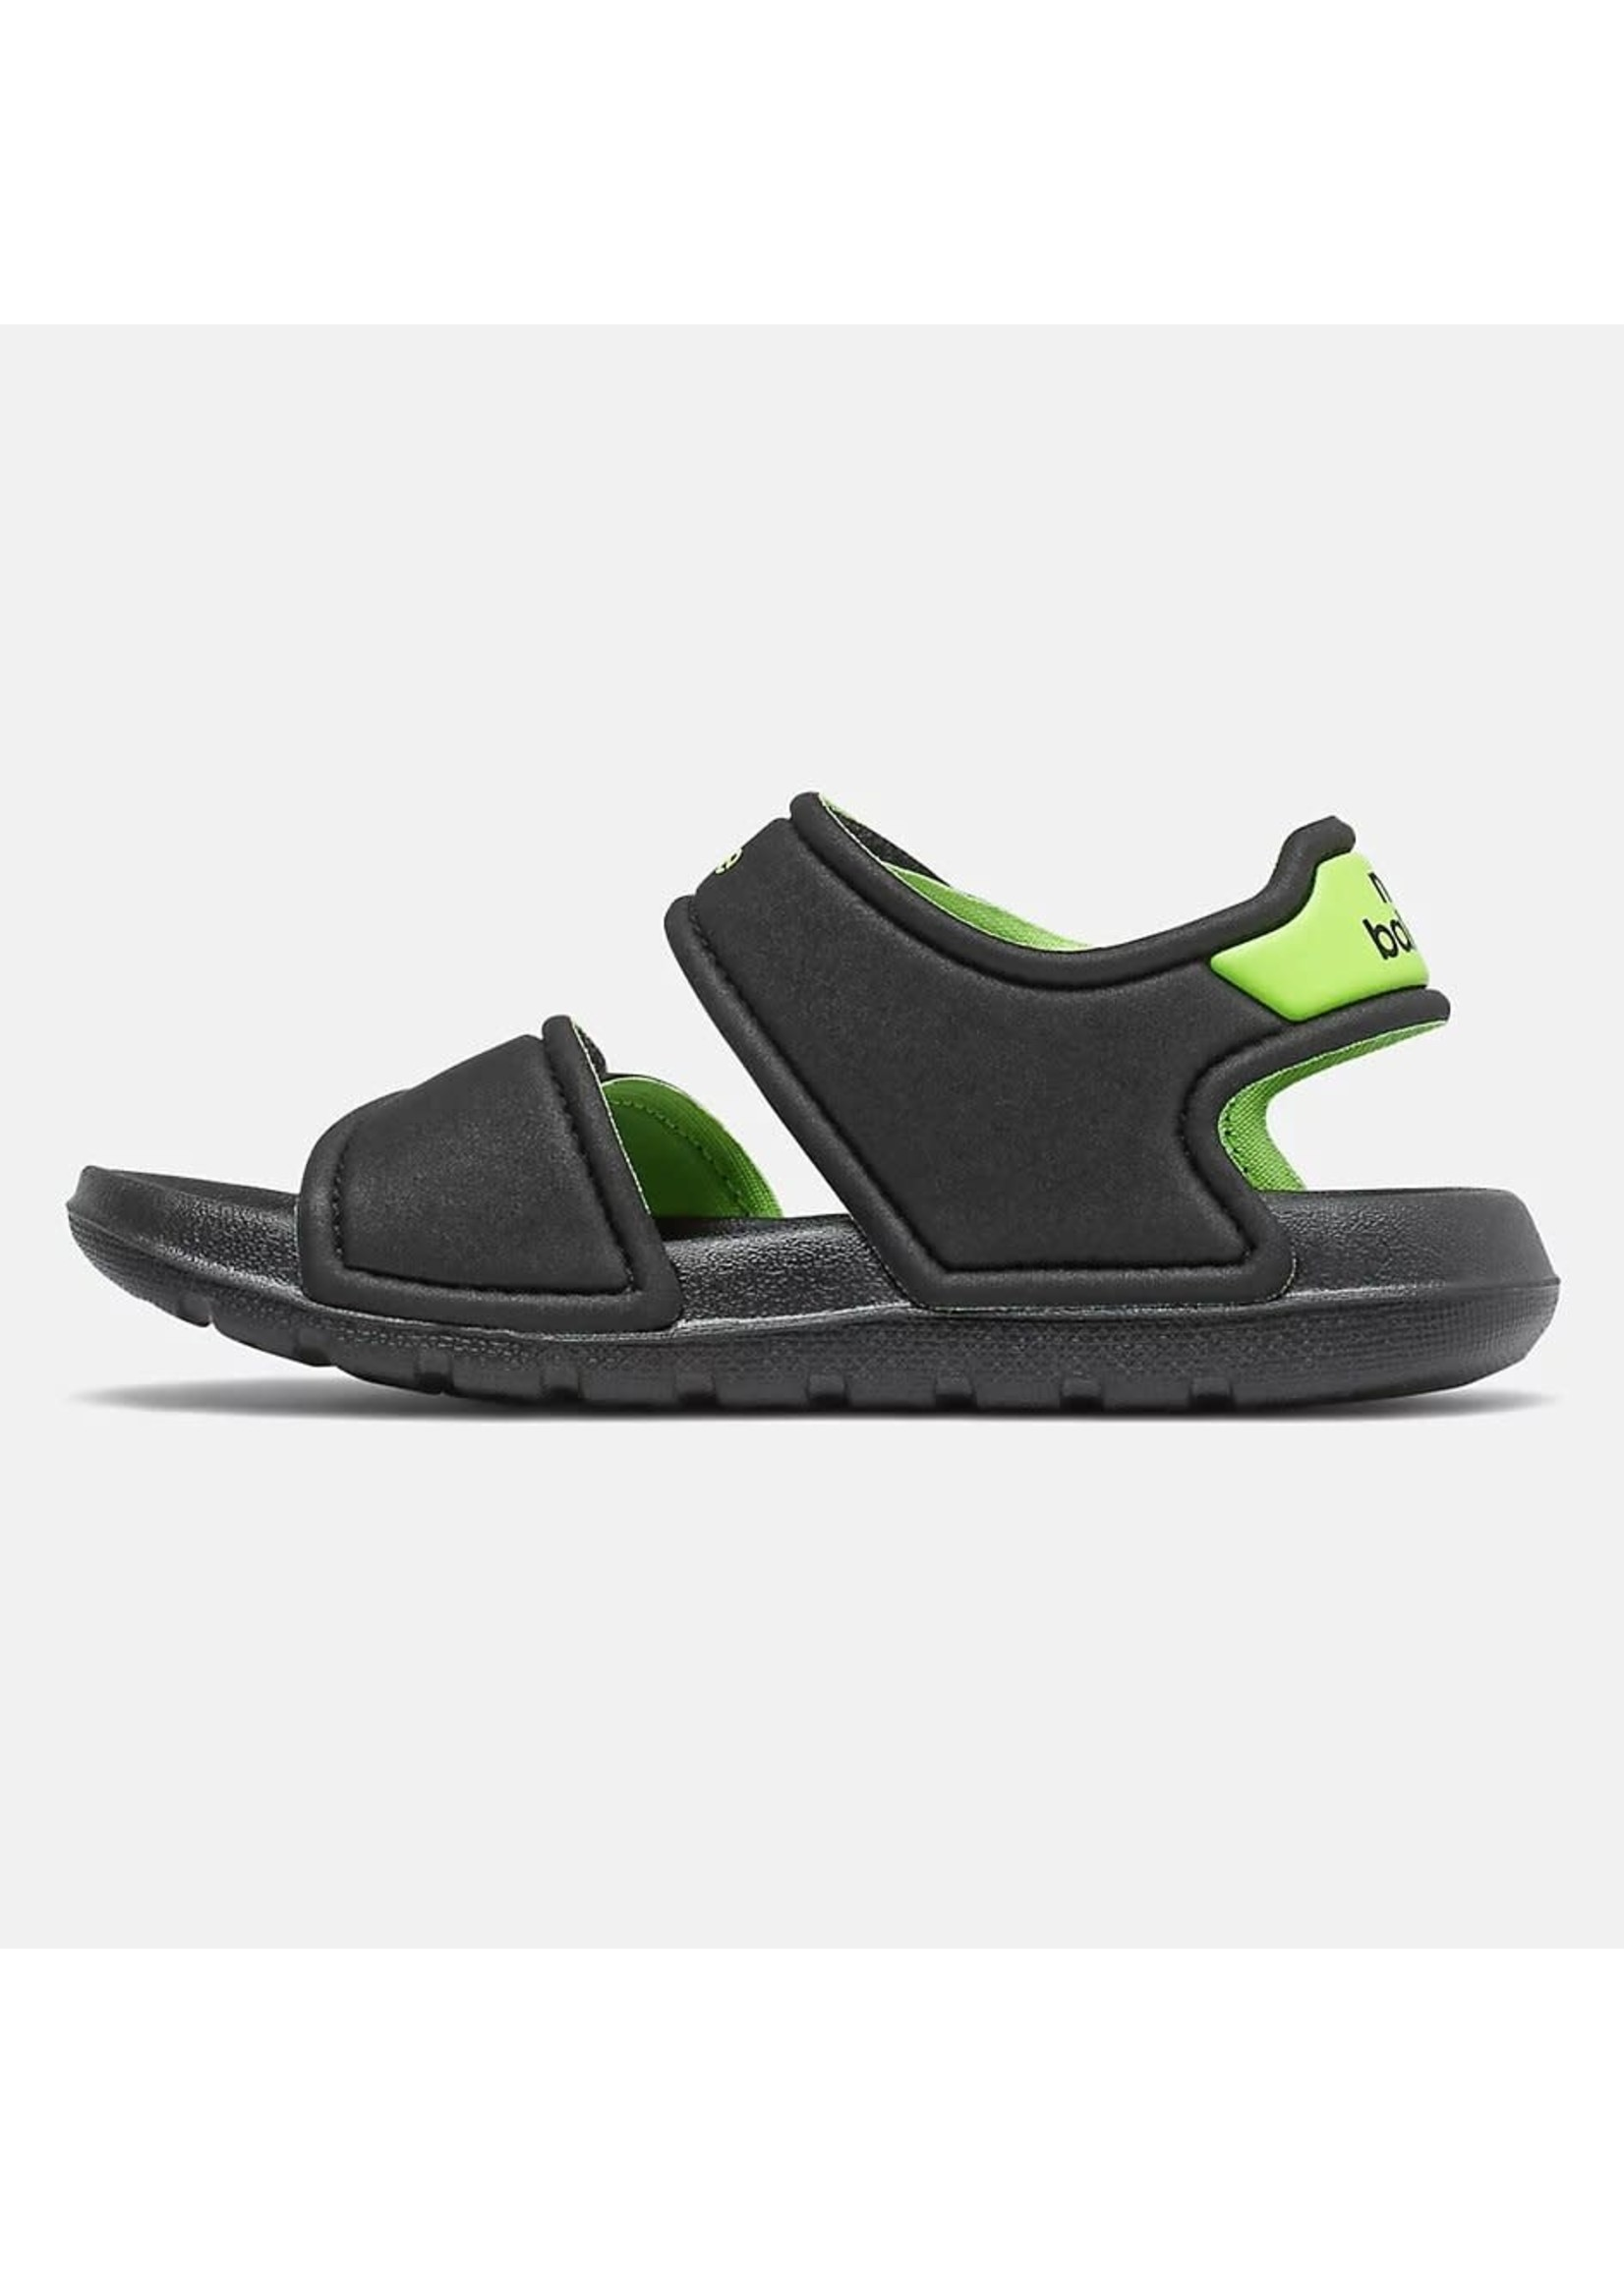 NEW BALANCE Sandal sport synthetic